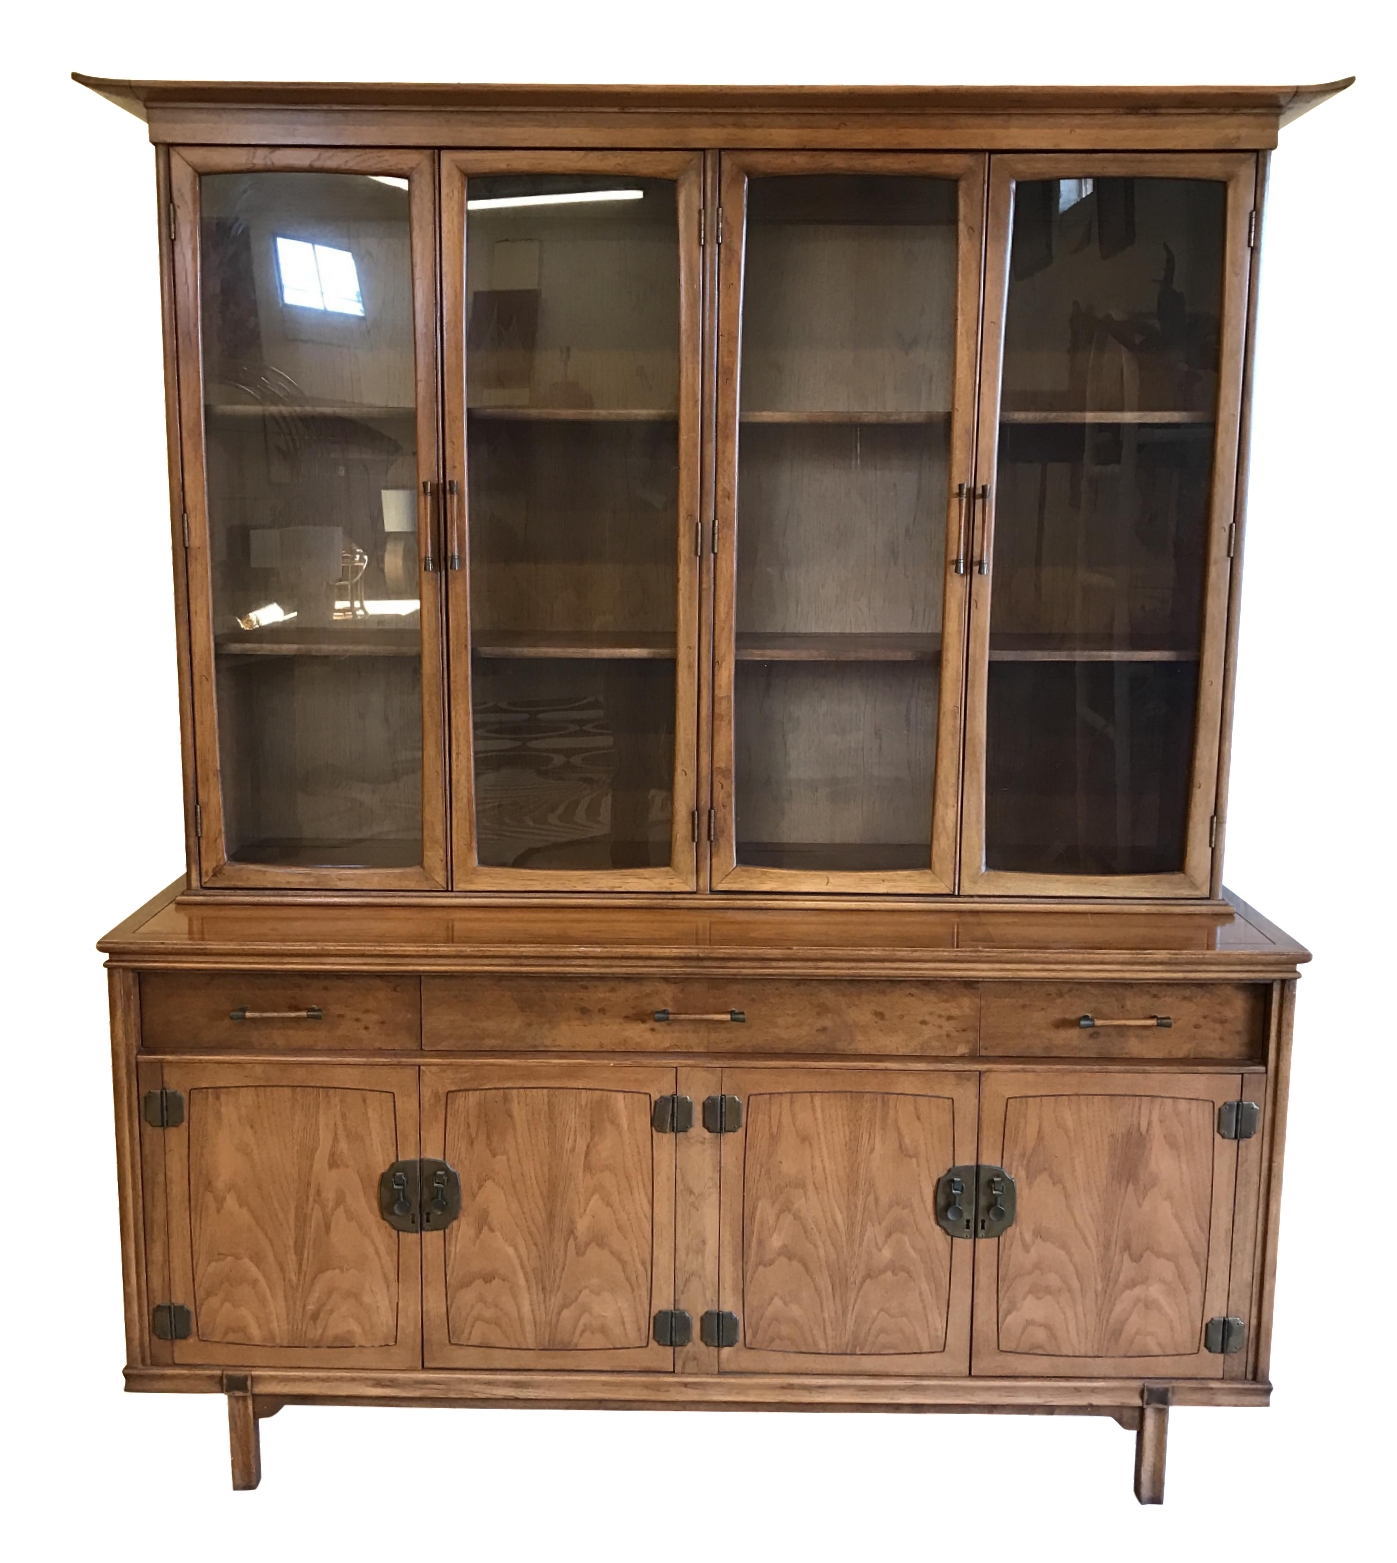 Hutch Display Cabinet Thomasville Walnut Asian Style China Cabinet Hutch Credenza Chairish